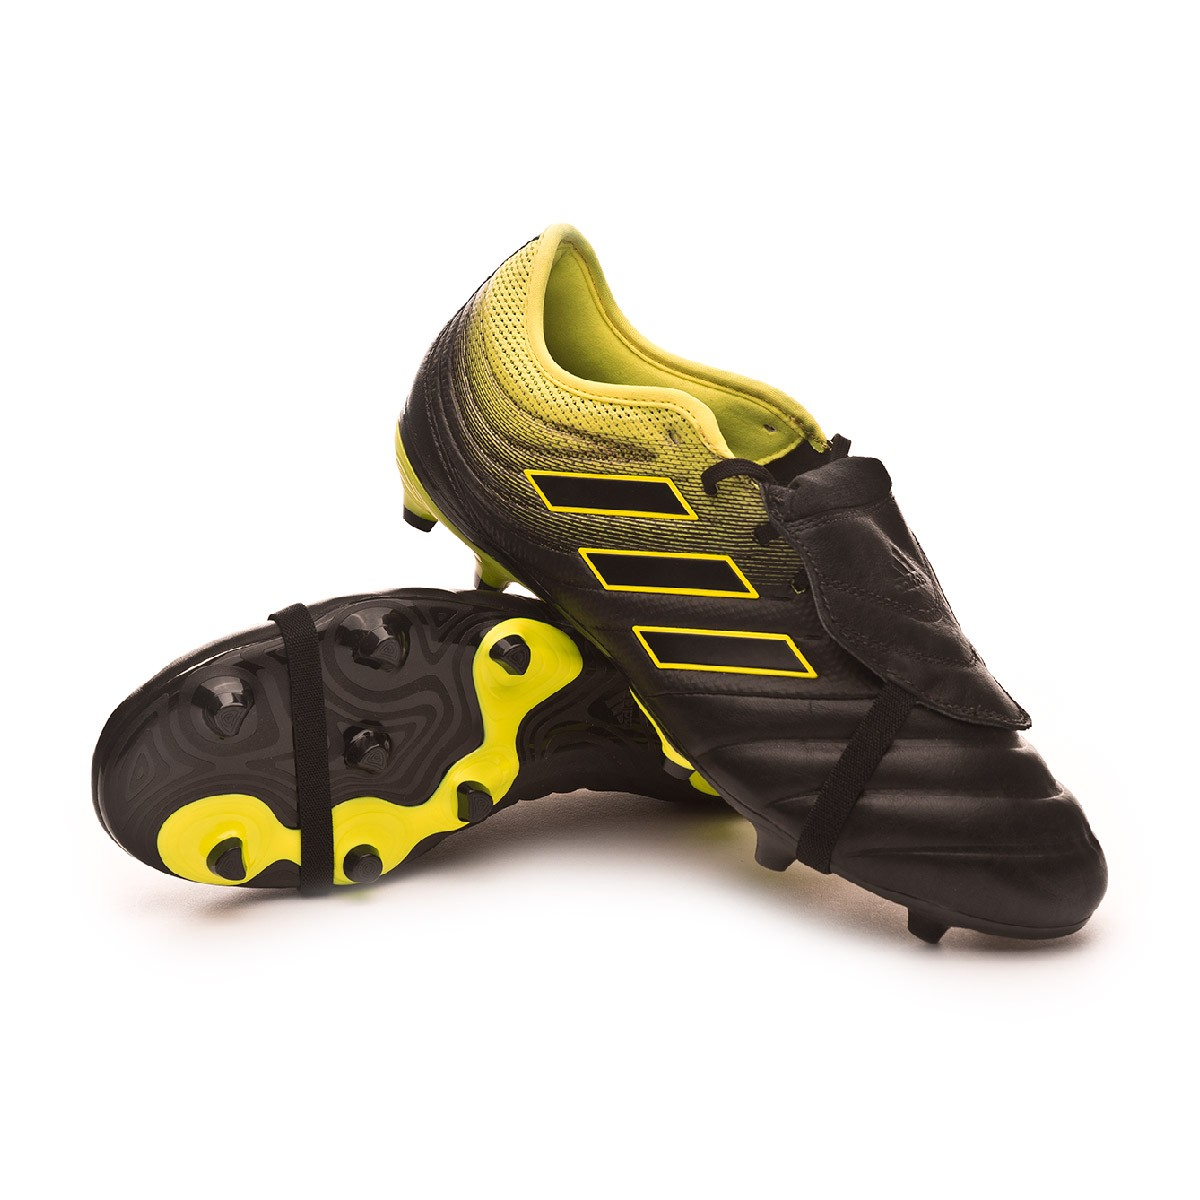 fbb0e0d233c8b Chuteira adidas Copa Gloro 19.2 FG Core black-Solar yellow-Core black -  Loja de futebol Fútbol Emotion